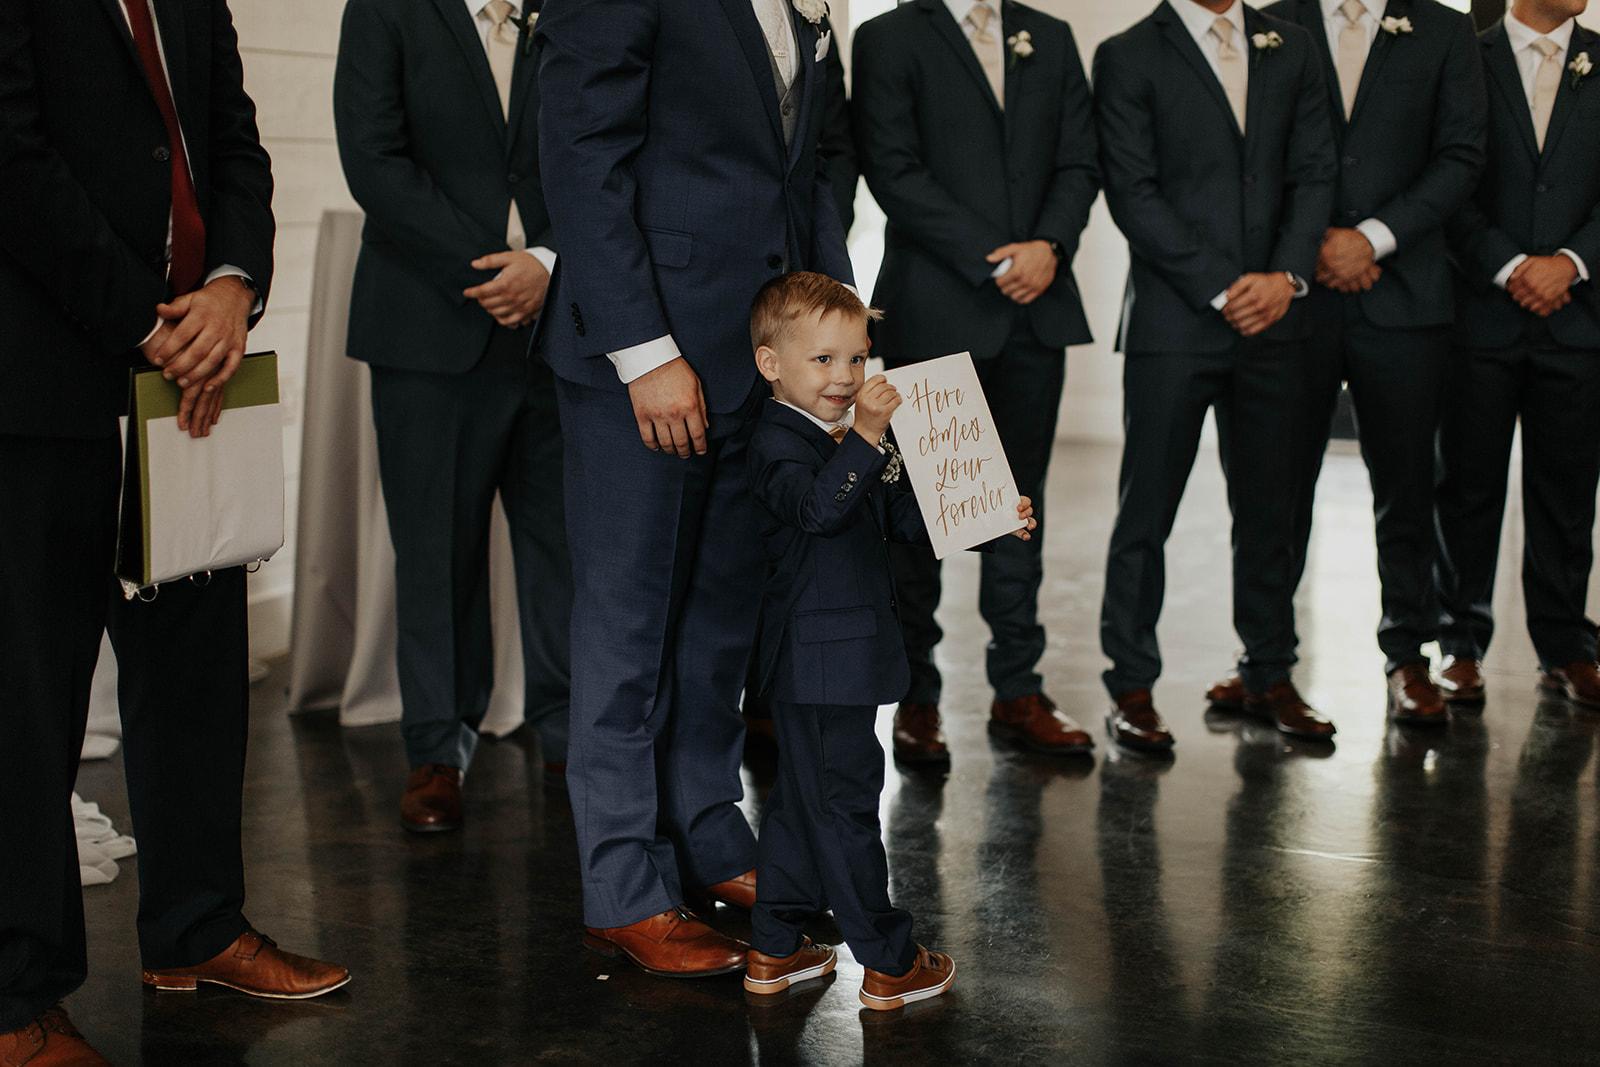 Tulsa Bixby Oklahoma Best Wedding and Reception Venue 13.jpg